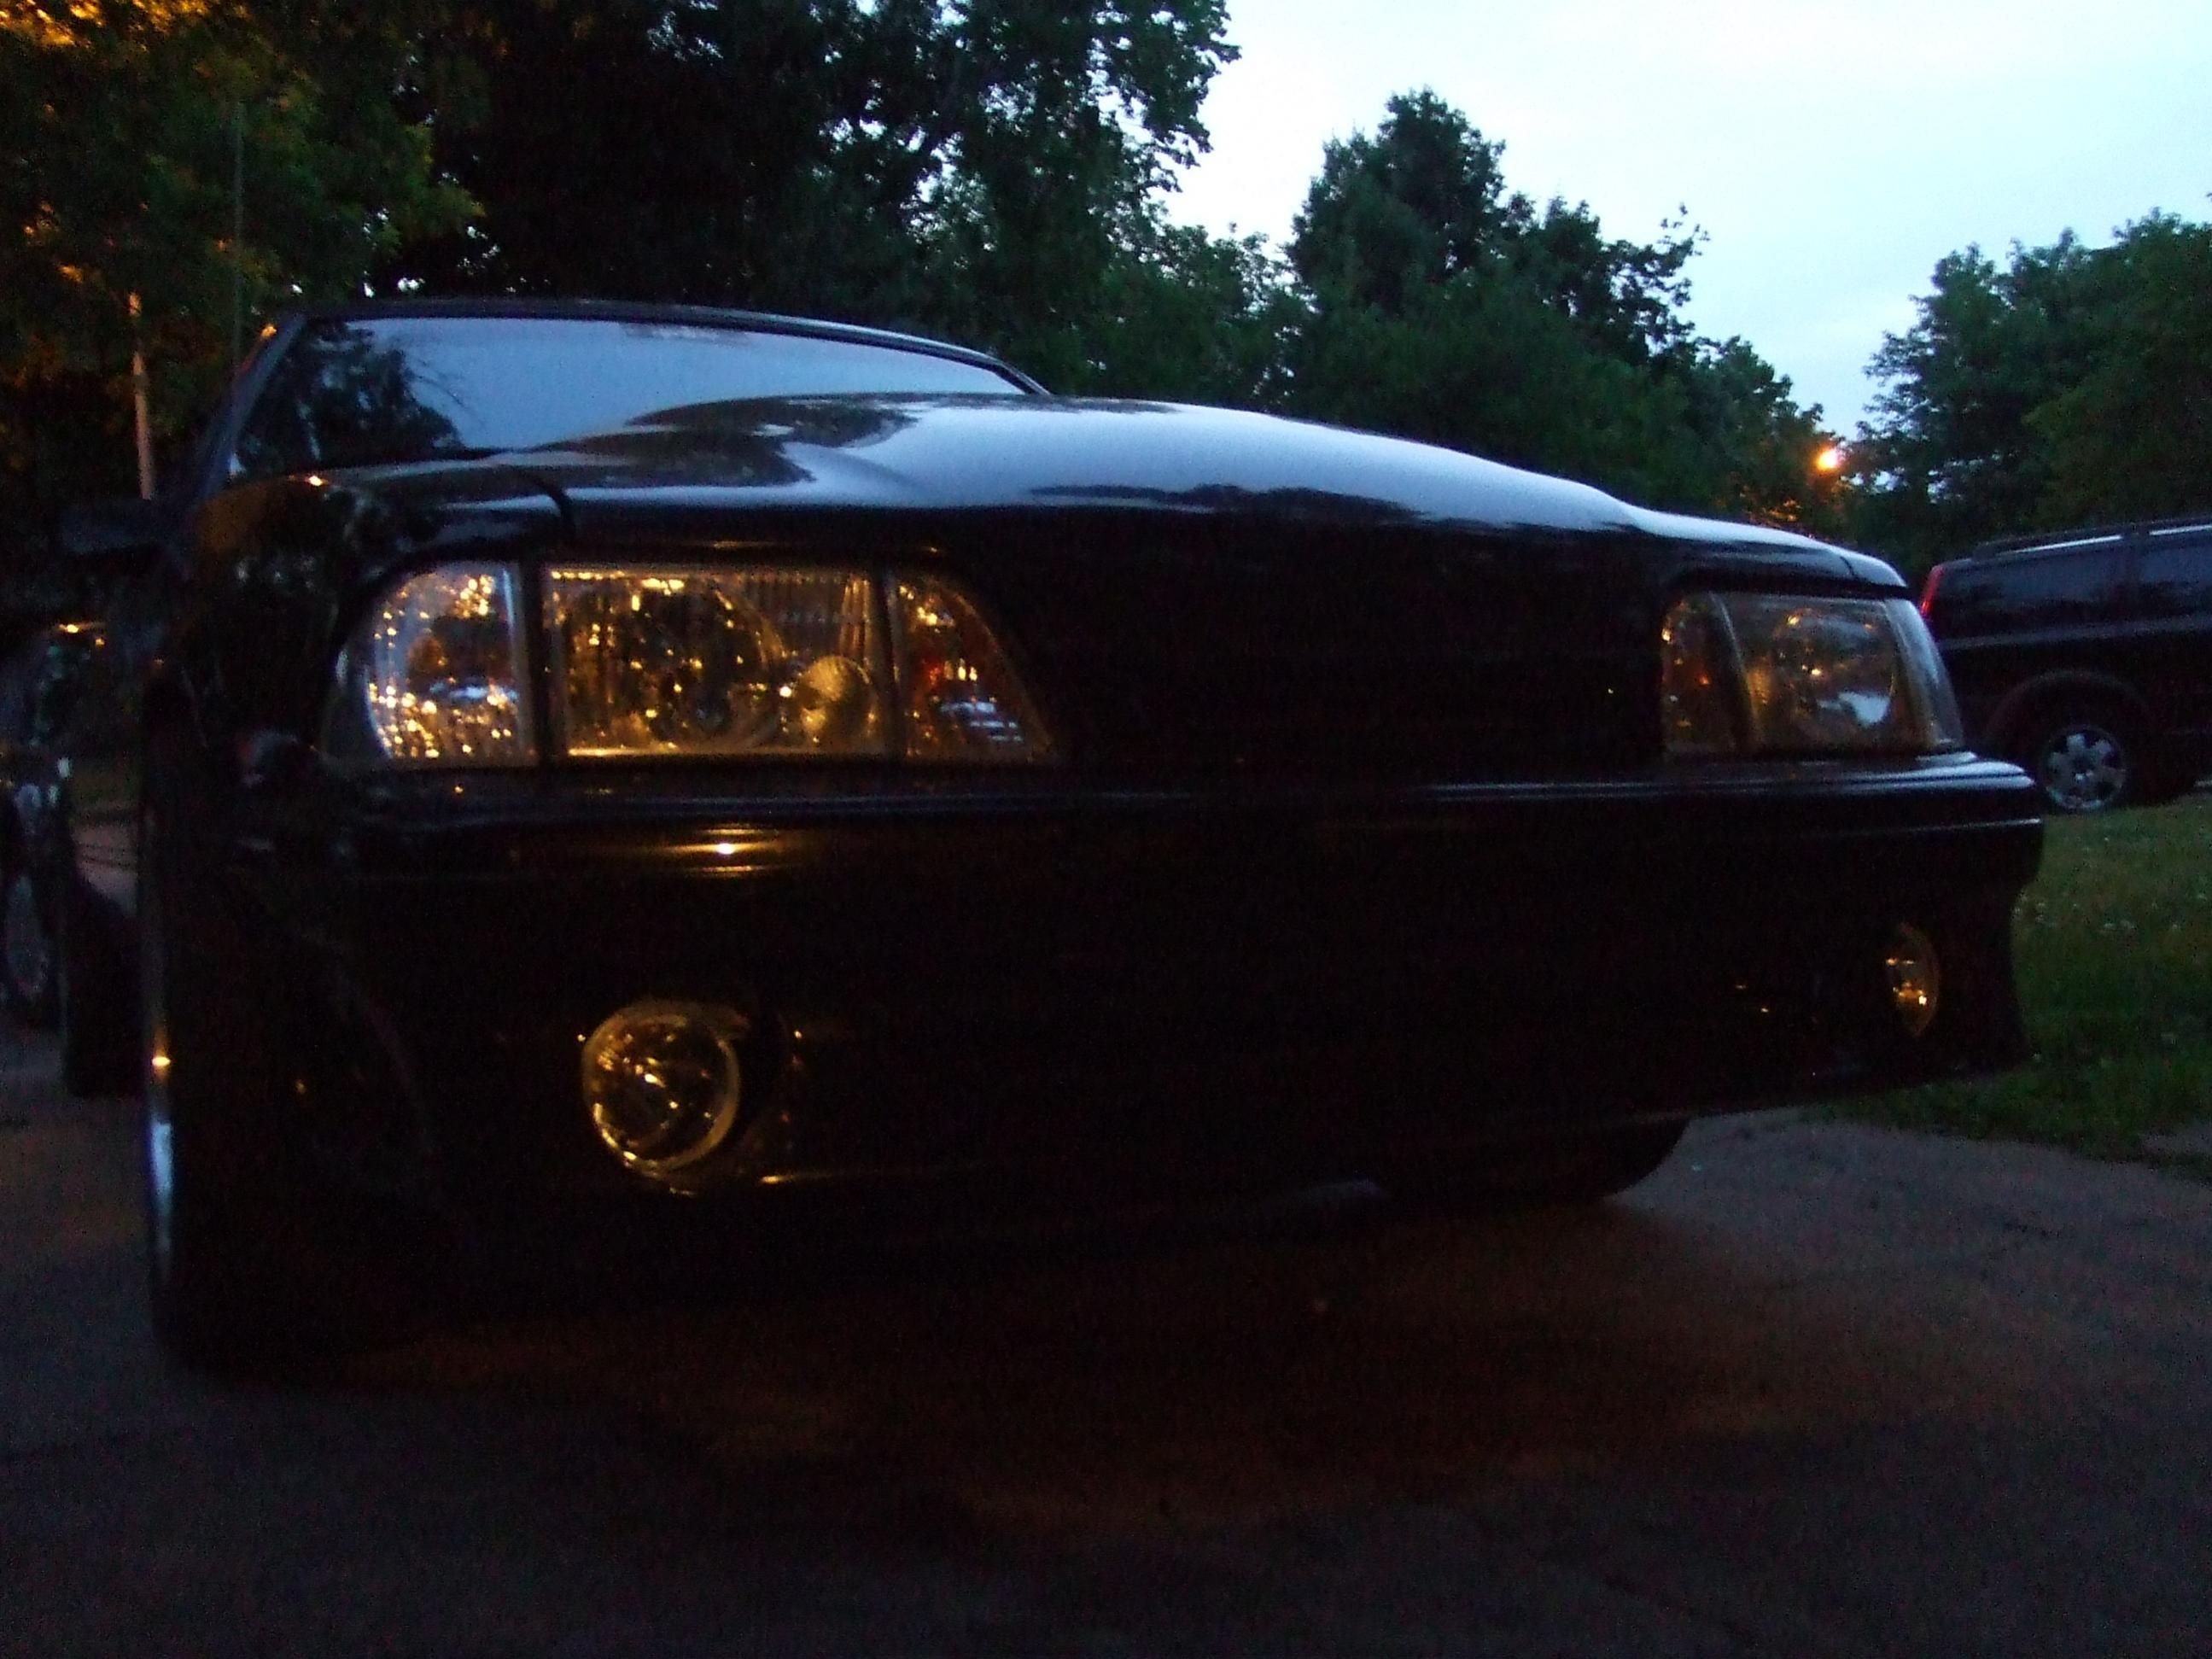 Wiring Gurusradio And Headlights Related Plus I Installed Fog 1988 Mustang Lights